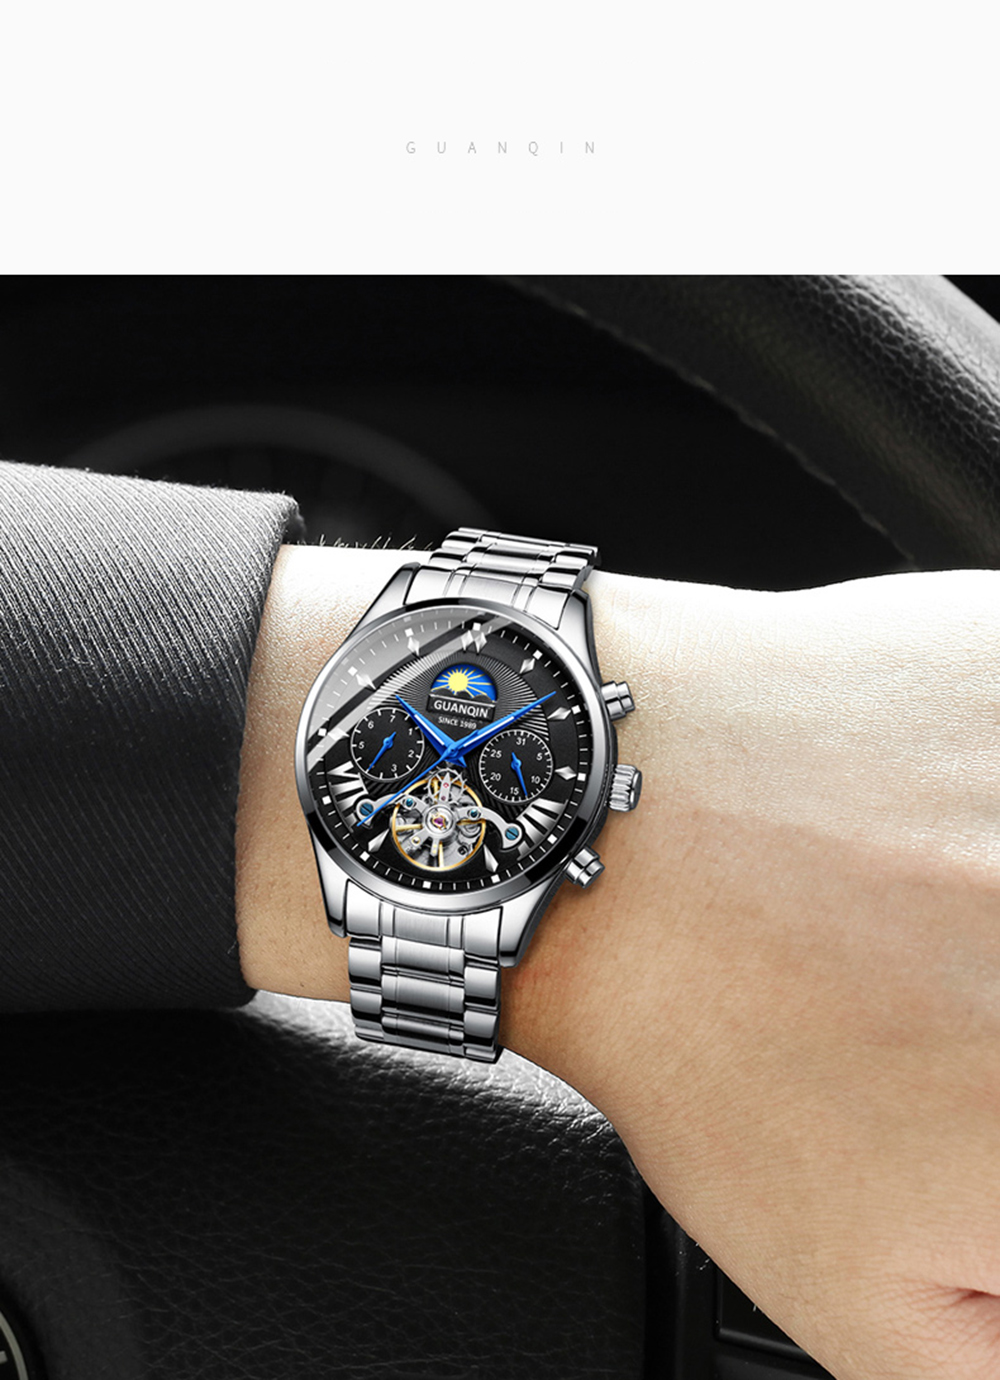 HTB1PywiRgHqK1RjSZFgq6y7JXXa6 GUANQIN 2019 clock men's/mens watches top brand luxury automatic/mechanical/luxury watch men gold tourbillon mens reloj hombre